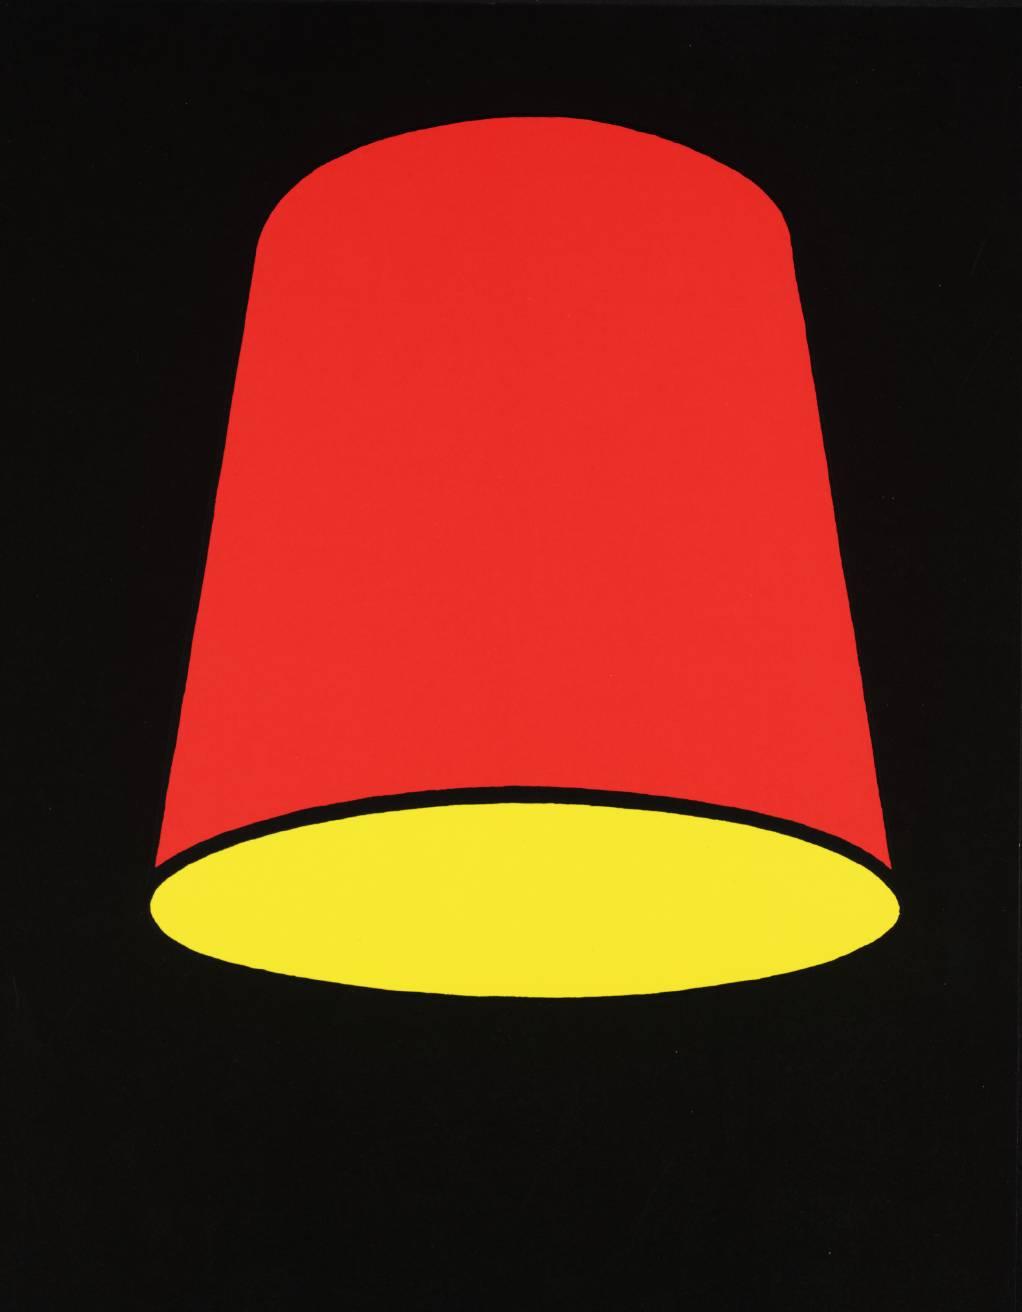 Lampshade, 1969 - Patrick Caulfield - WikiArt.org